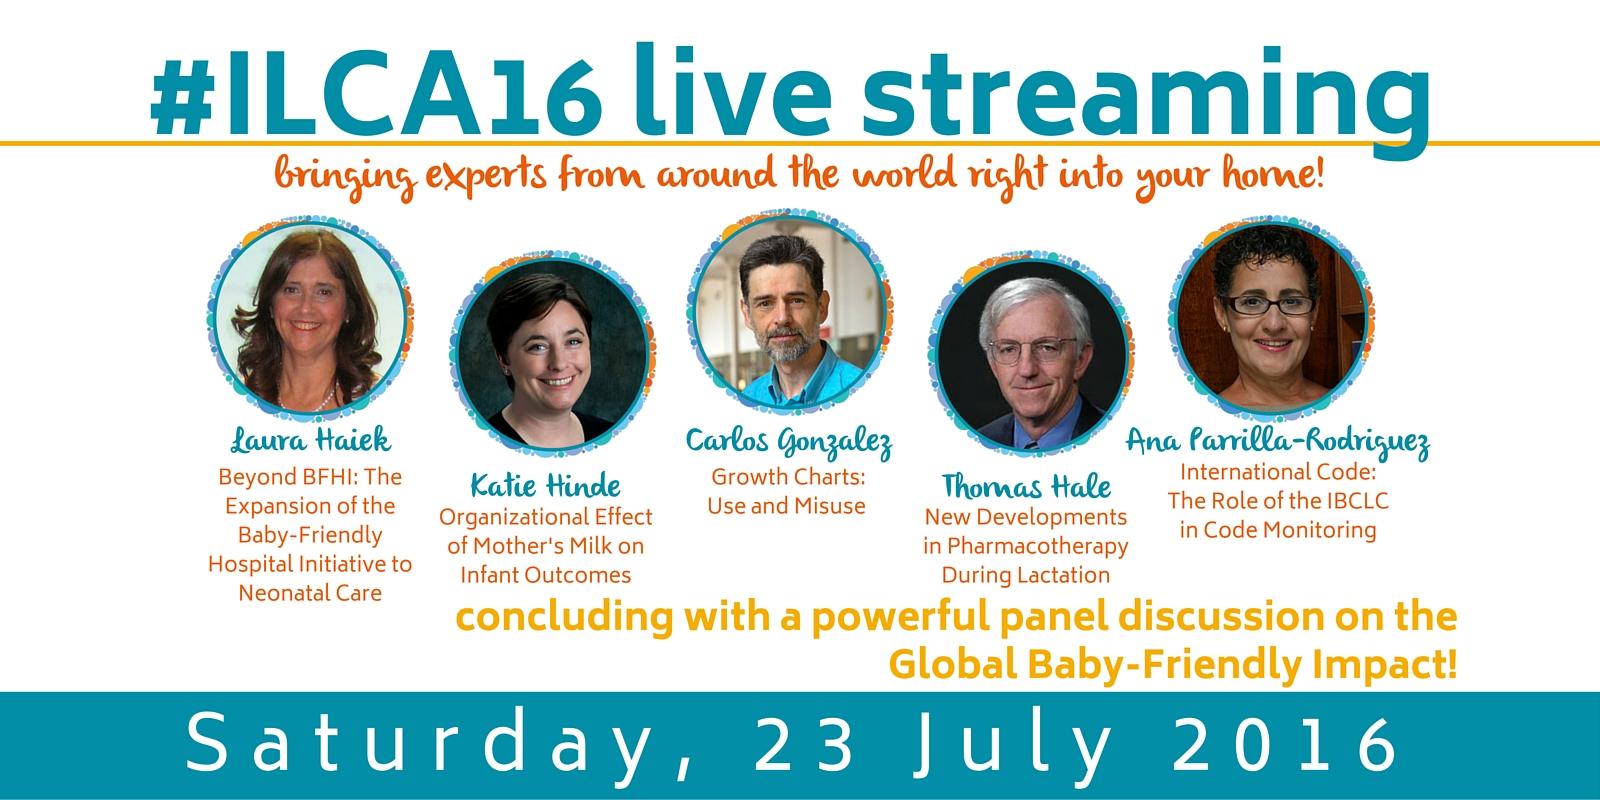 #ILCA16 live streaming